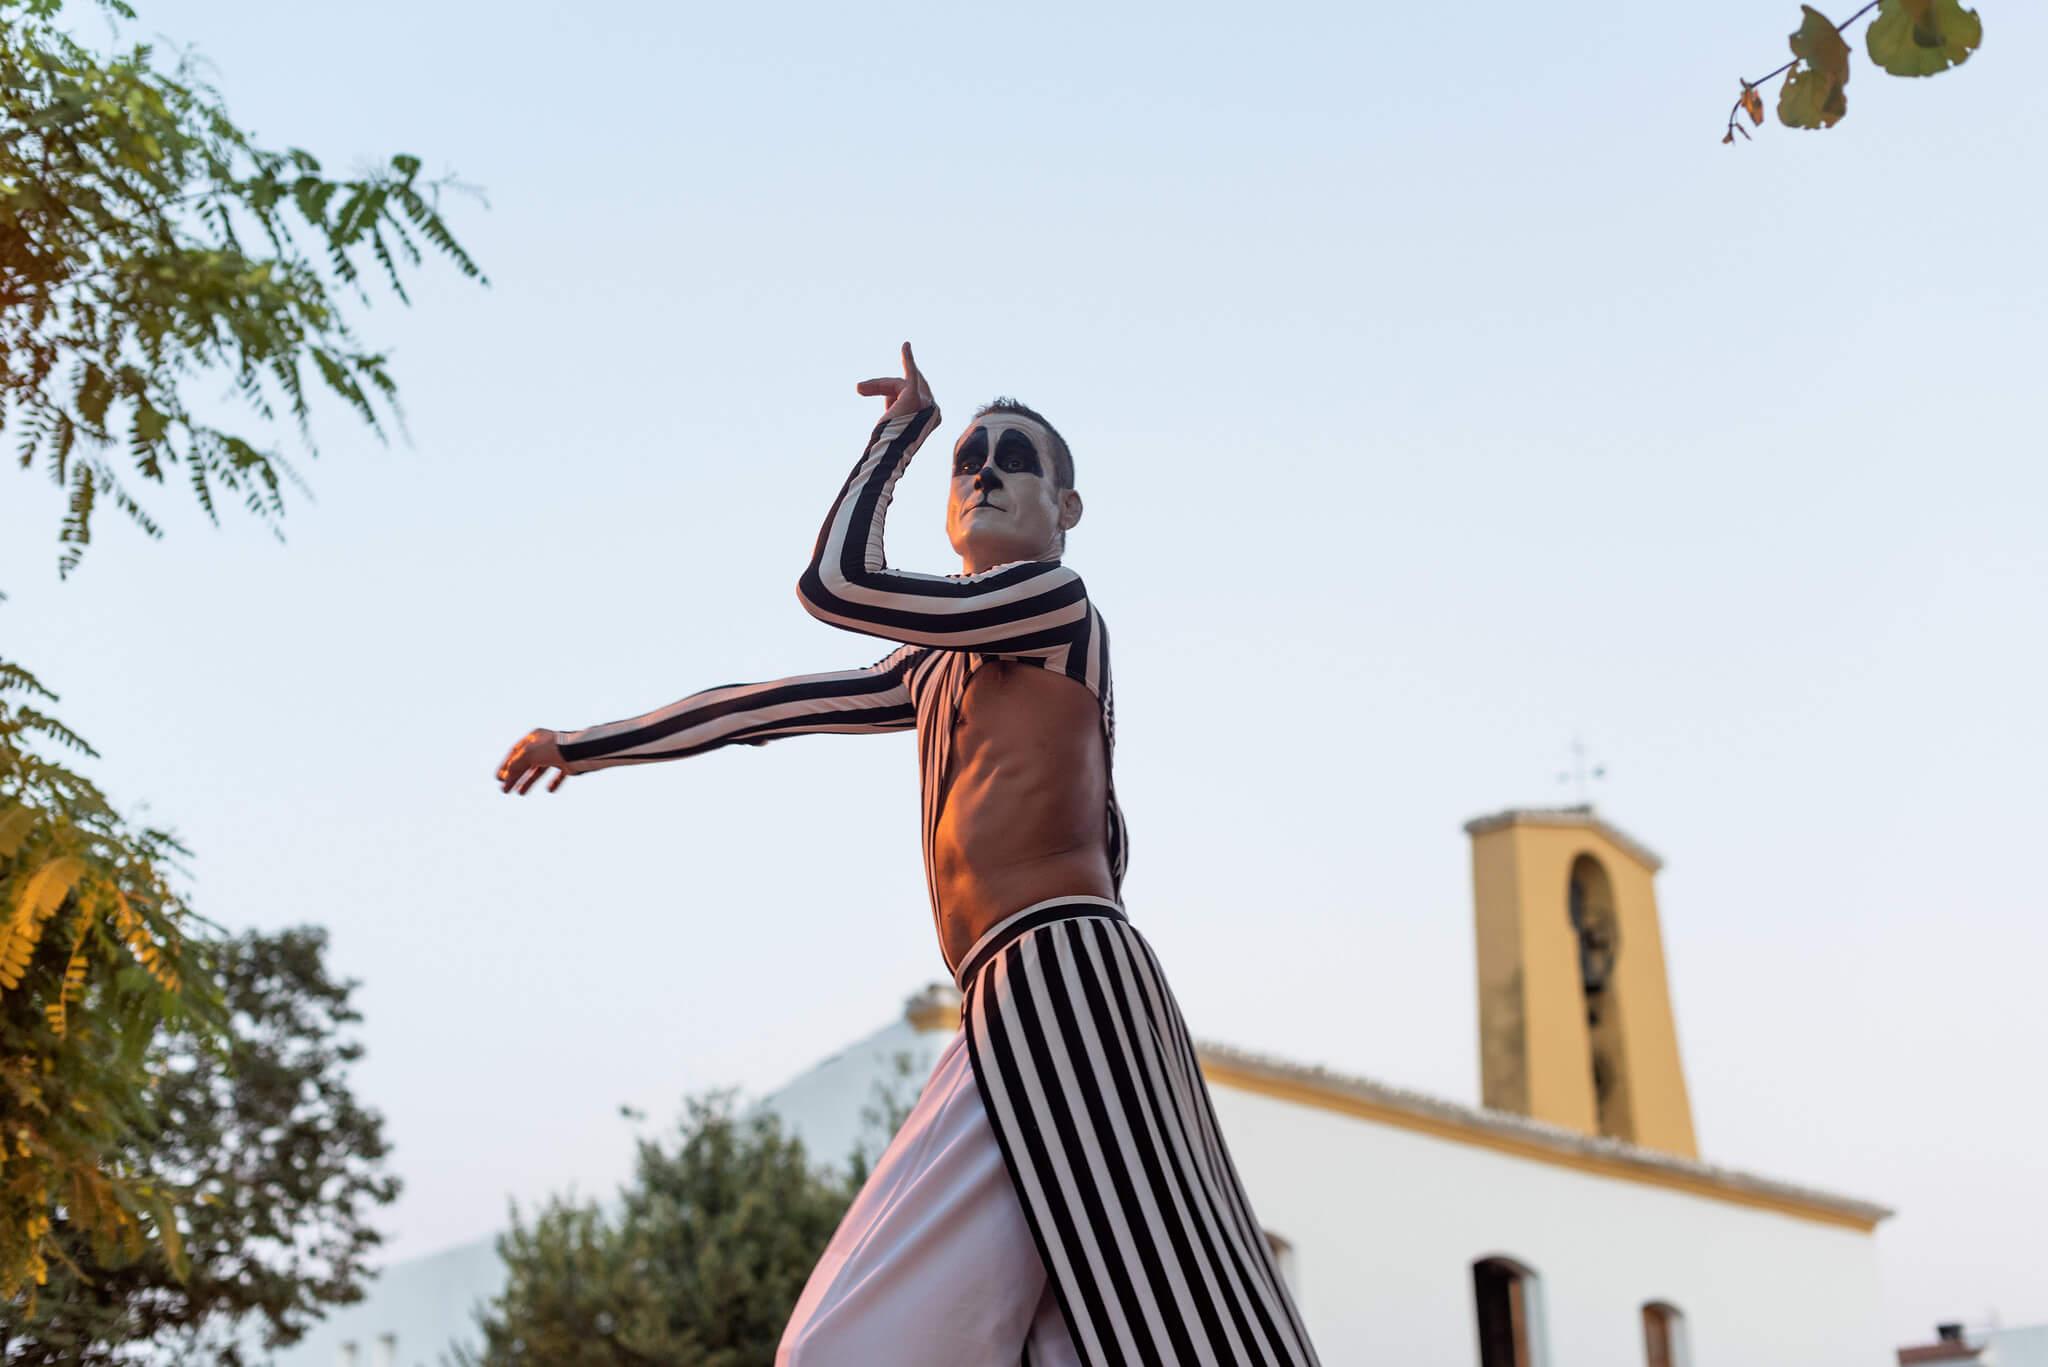 https://www.white-ibiza.com/wp-content/uploads/2020/05/white-ibiza-villas-where-to-stay-santa-gertrudis-08.jpg